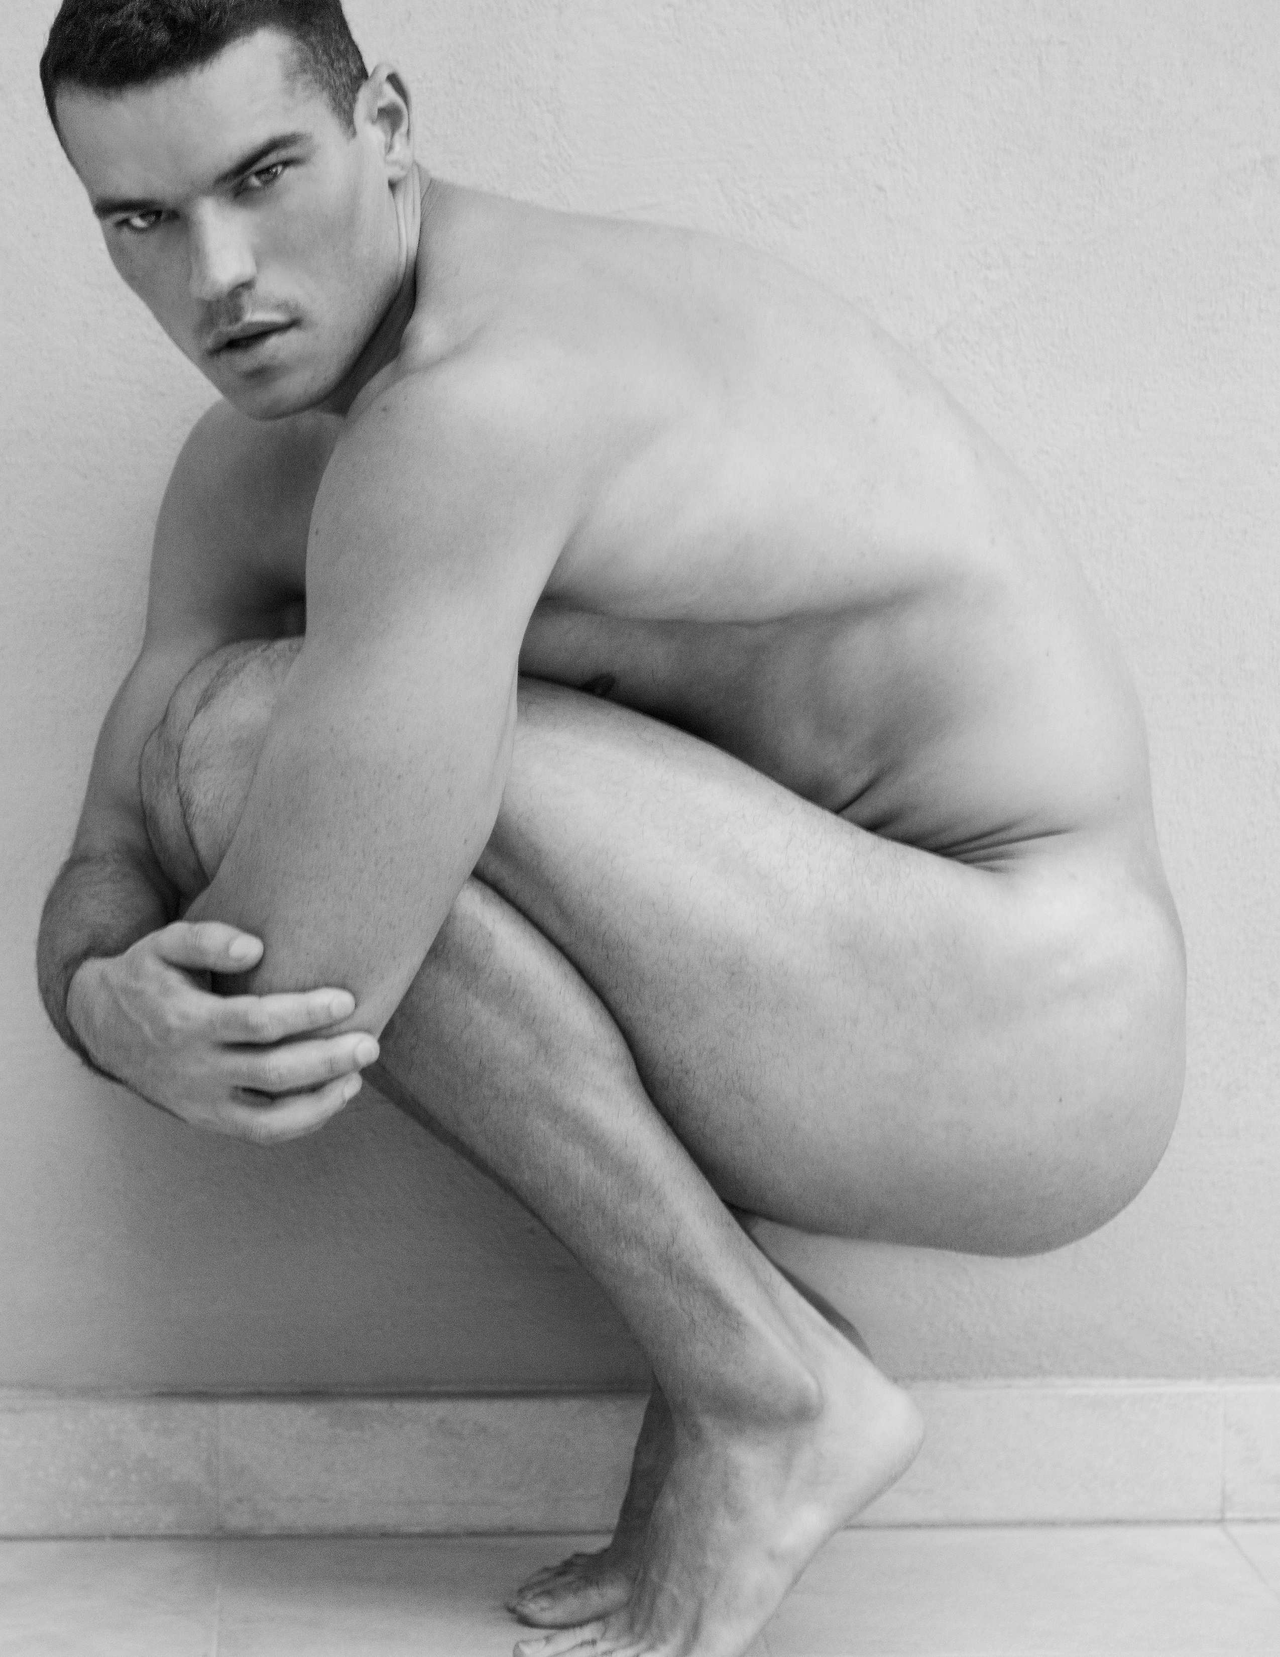 Andrea García Al Desnudo desnudo-homme-alexsandro-duarte-by-lucas-ferrier.-2019-www